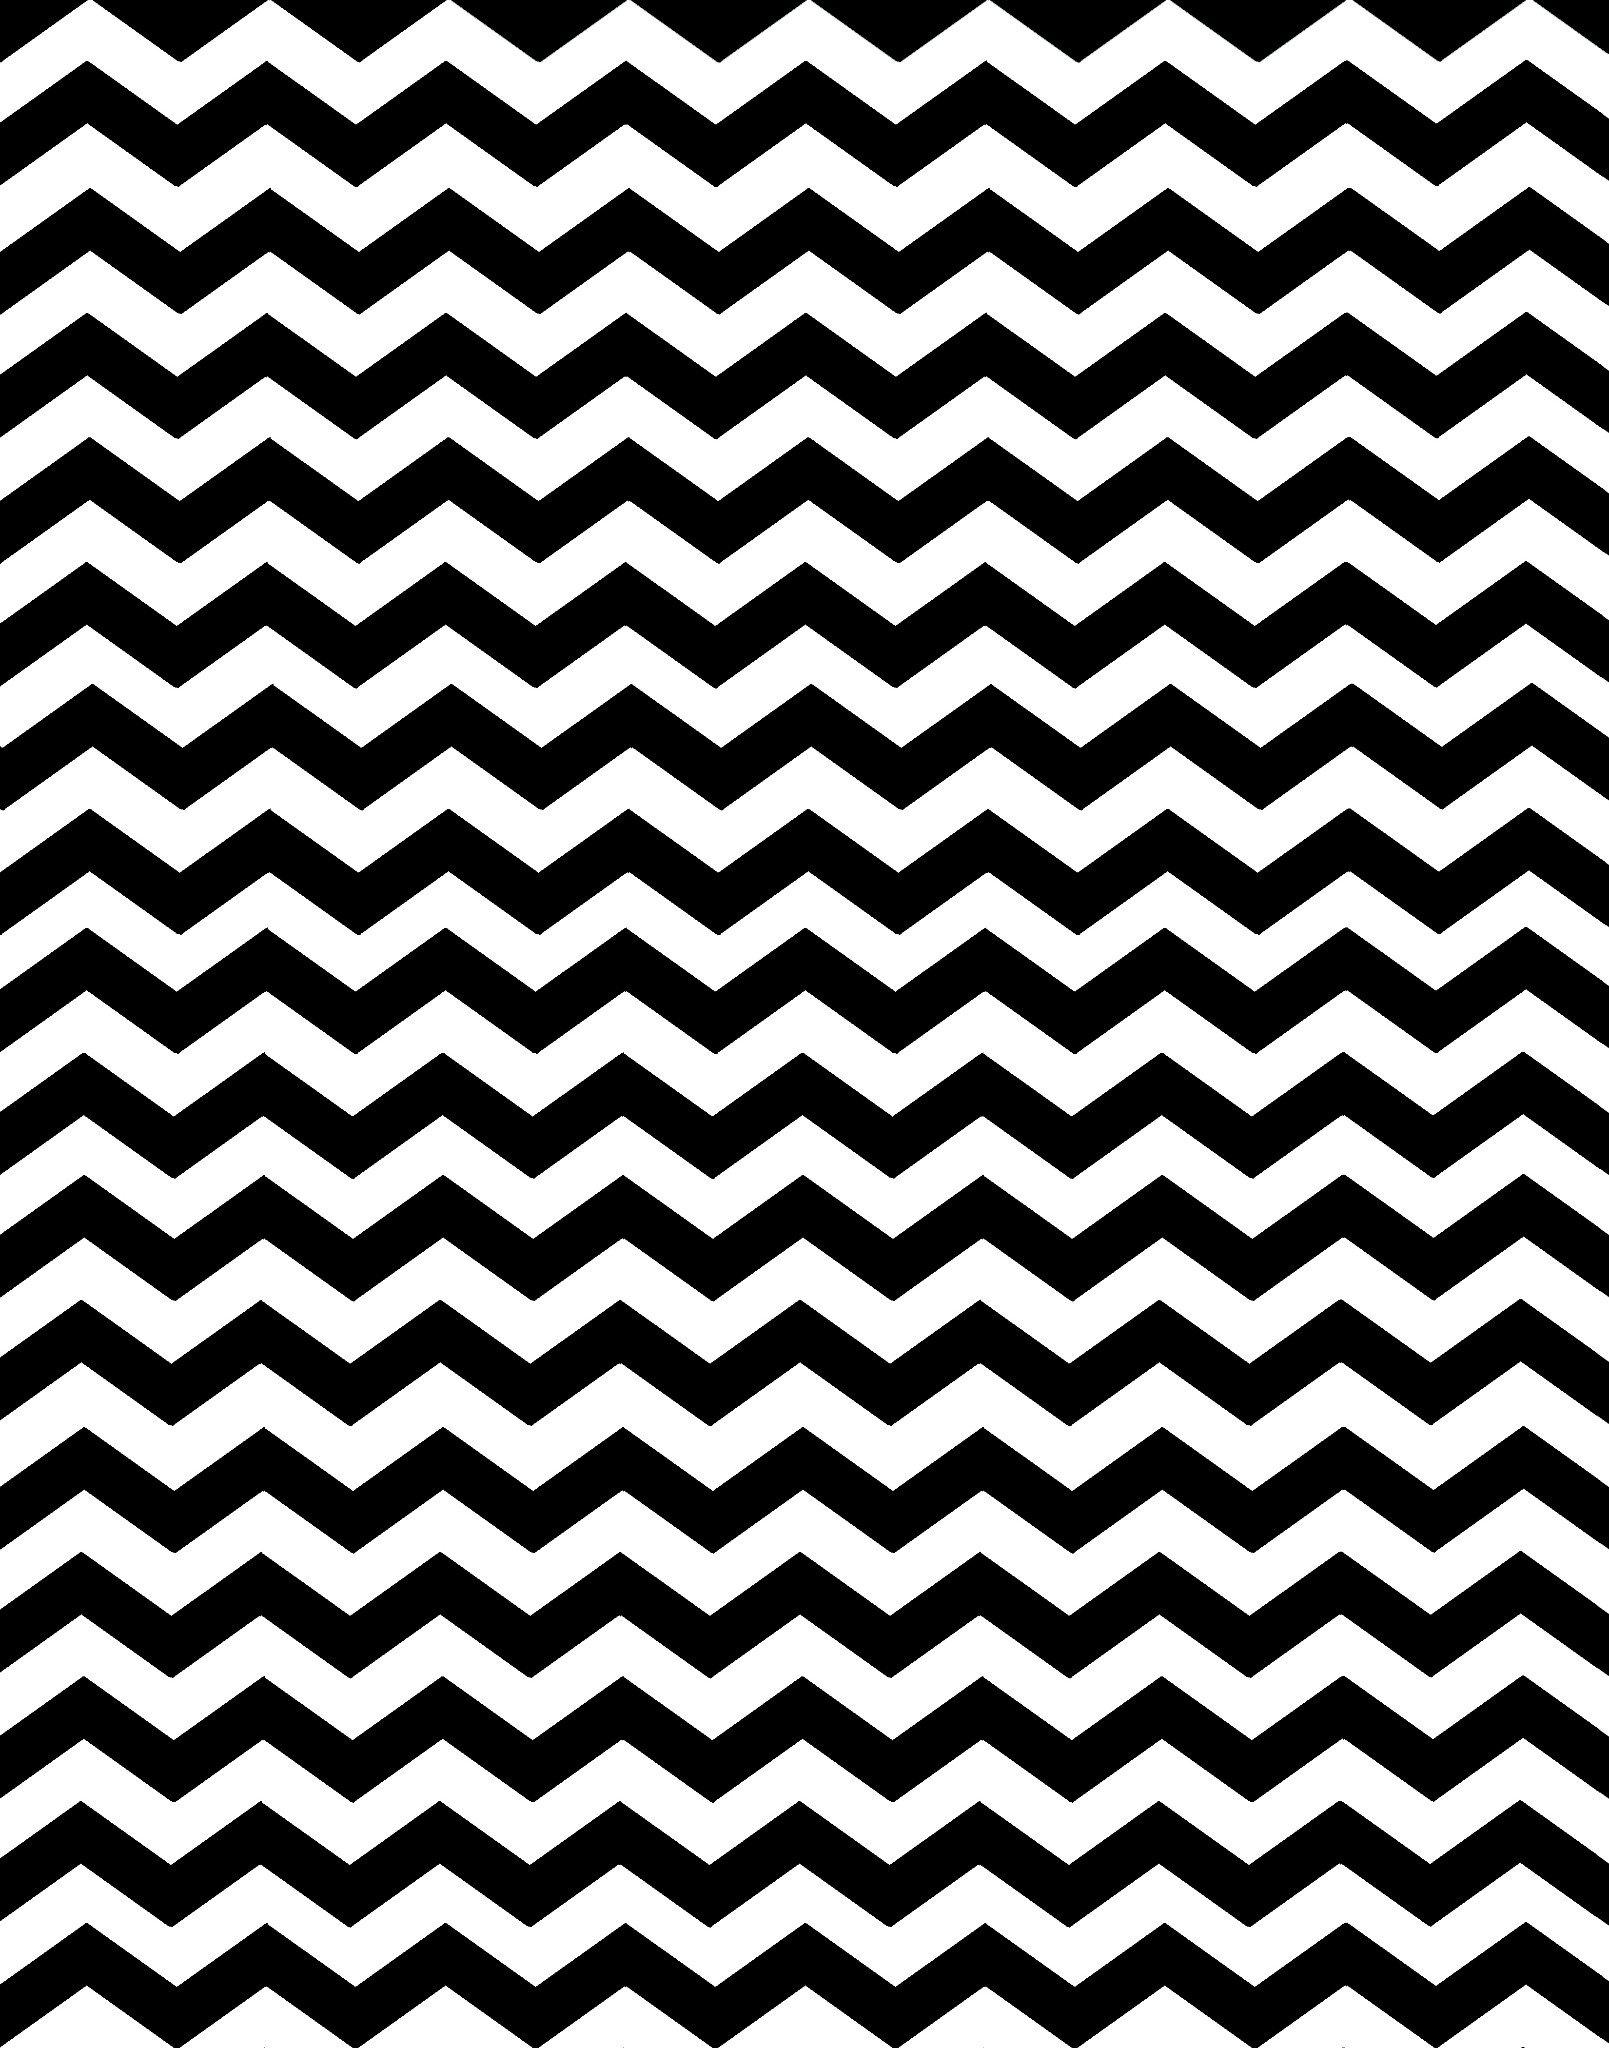 Black and White Chevron Wallpaper - WallpaperSafari